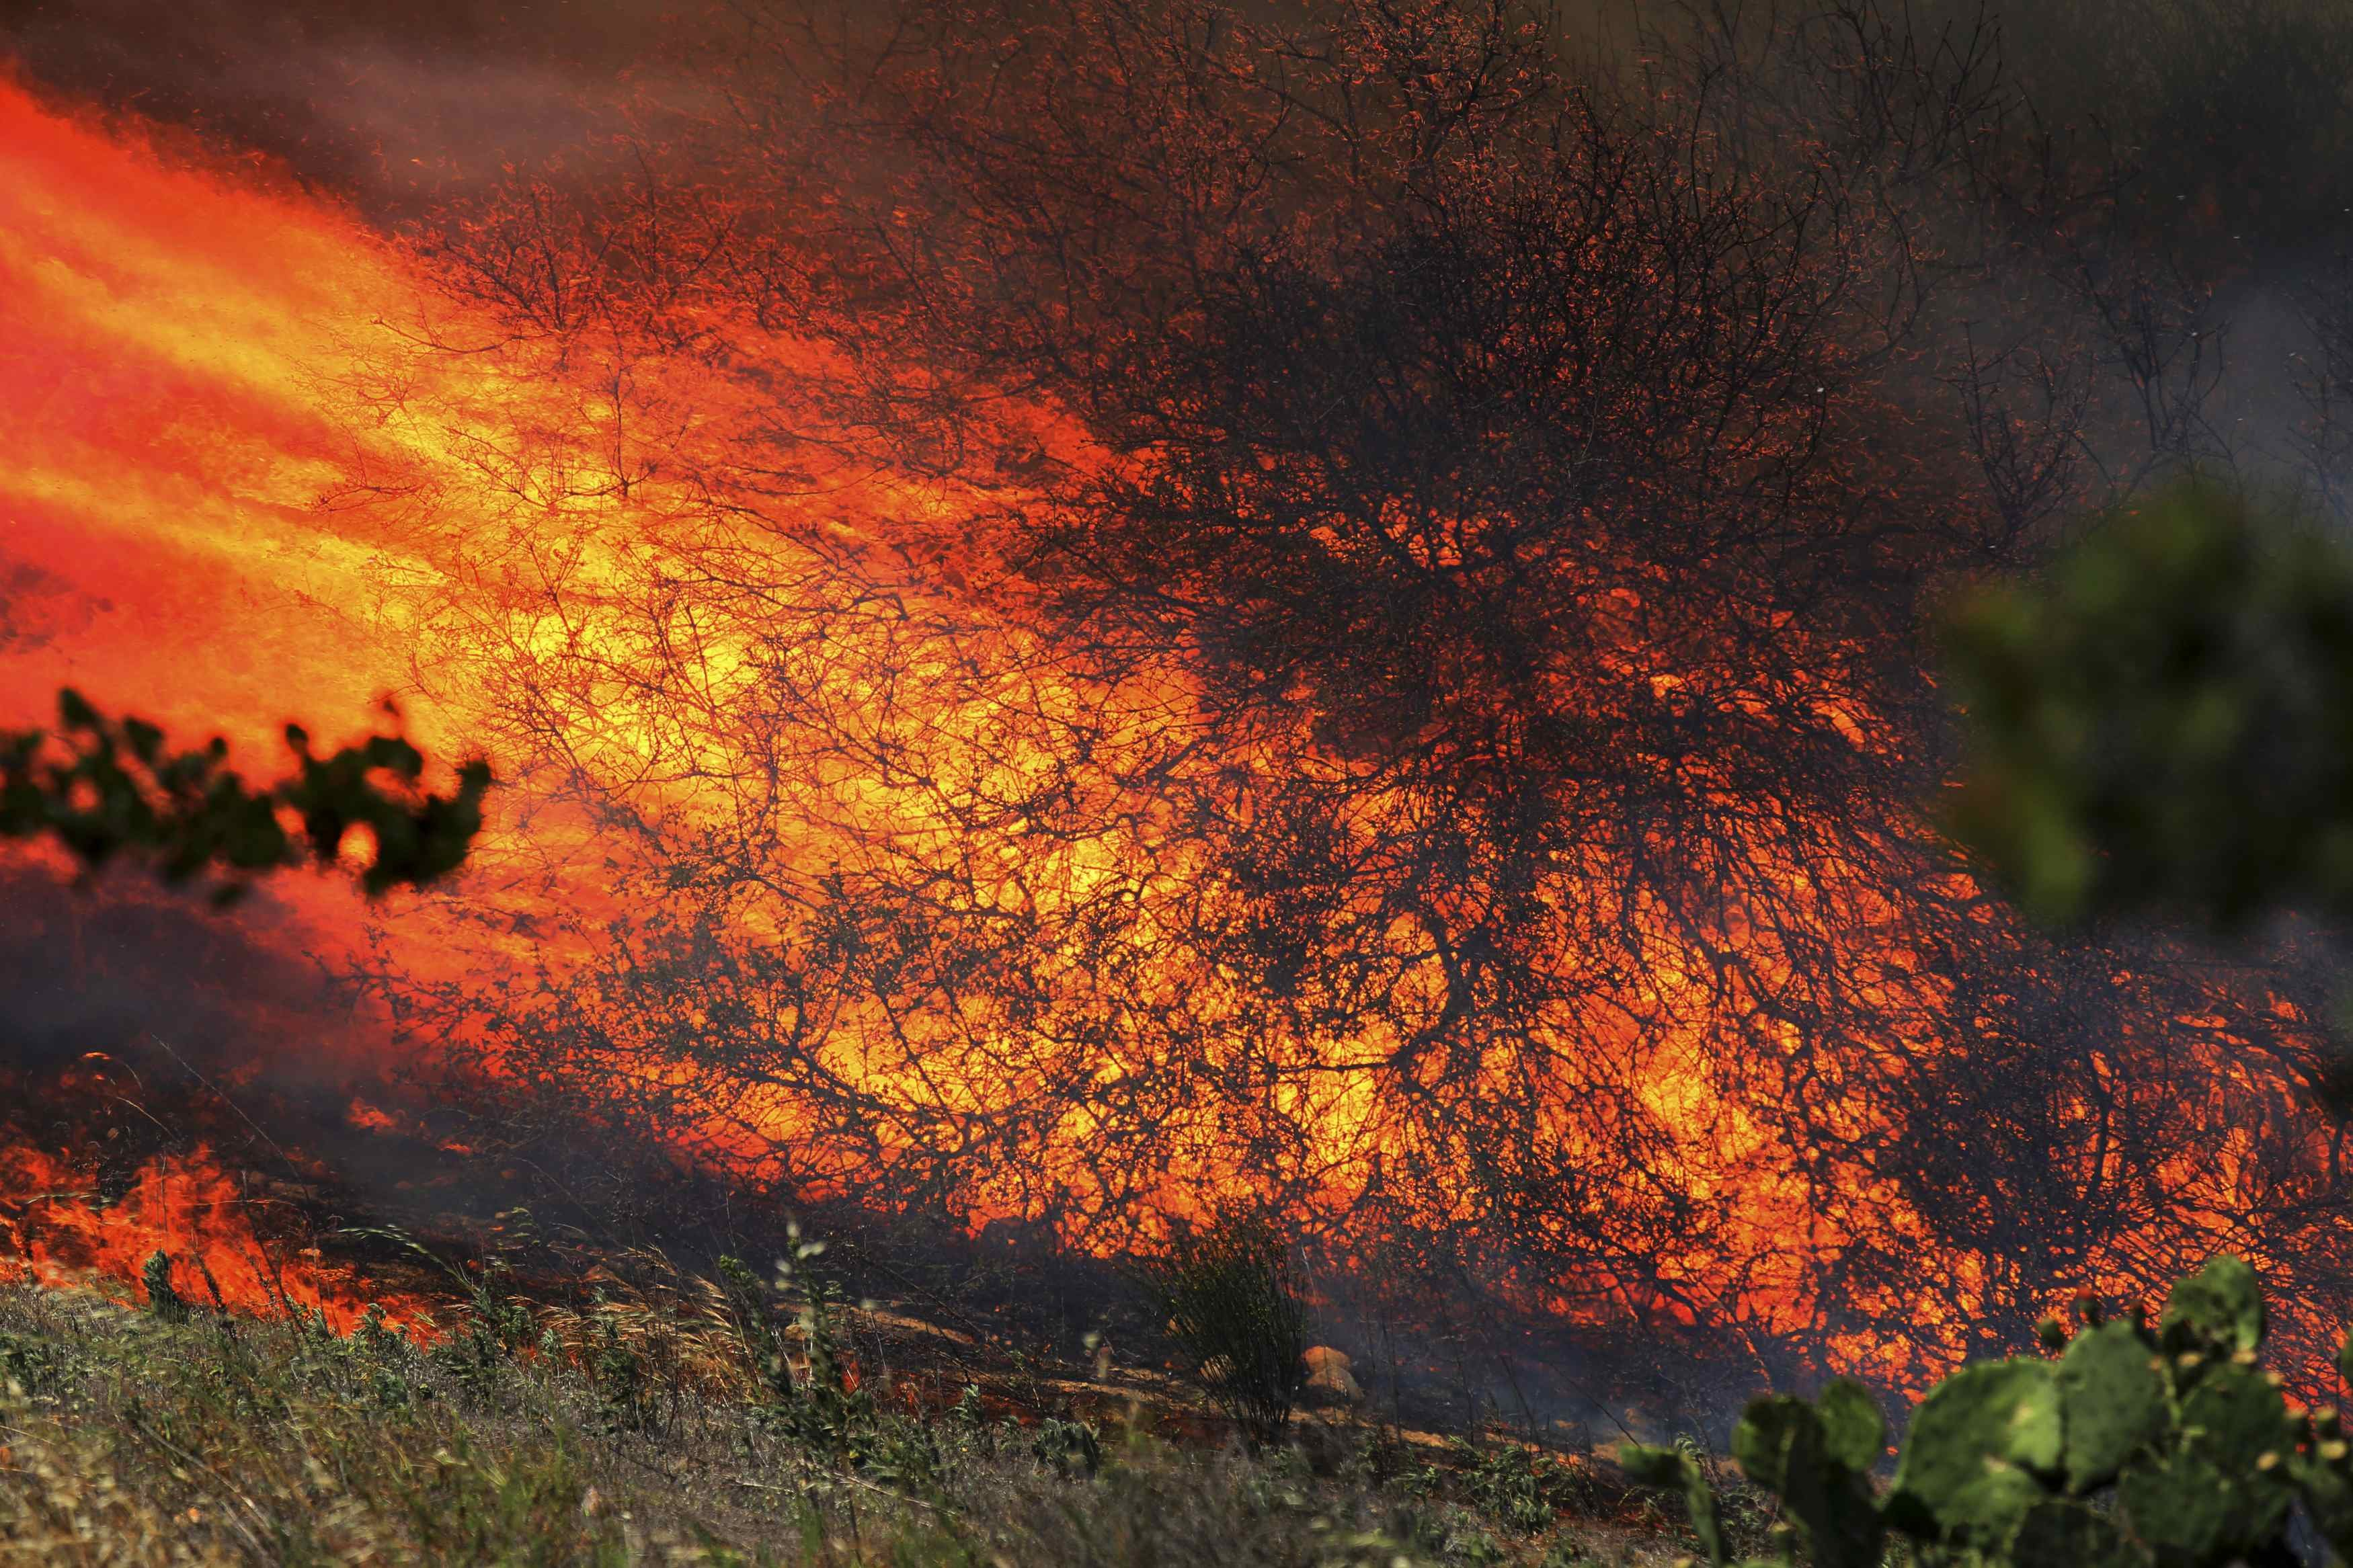 A bush is fully engulfed in flames near San Diego on May 13, 2014.